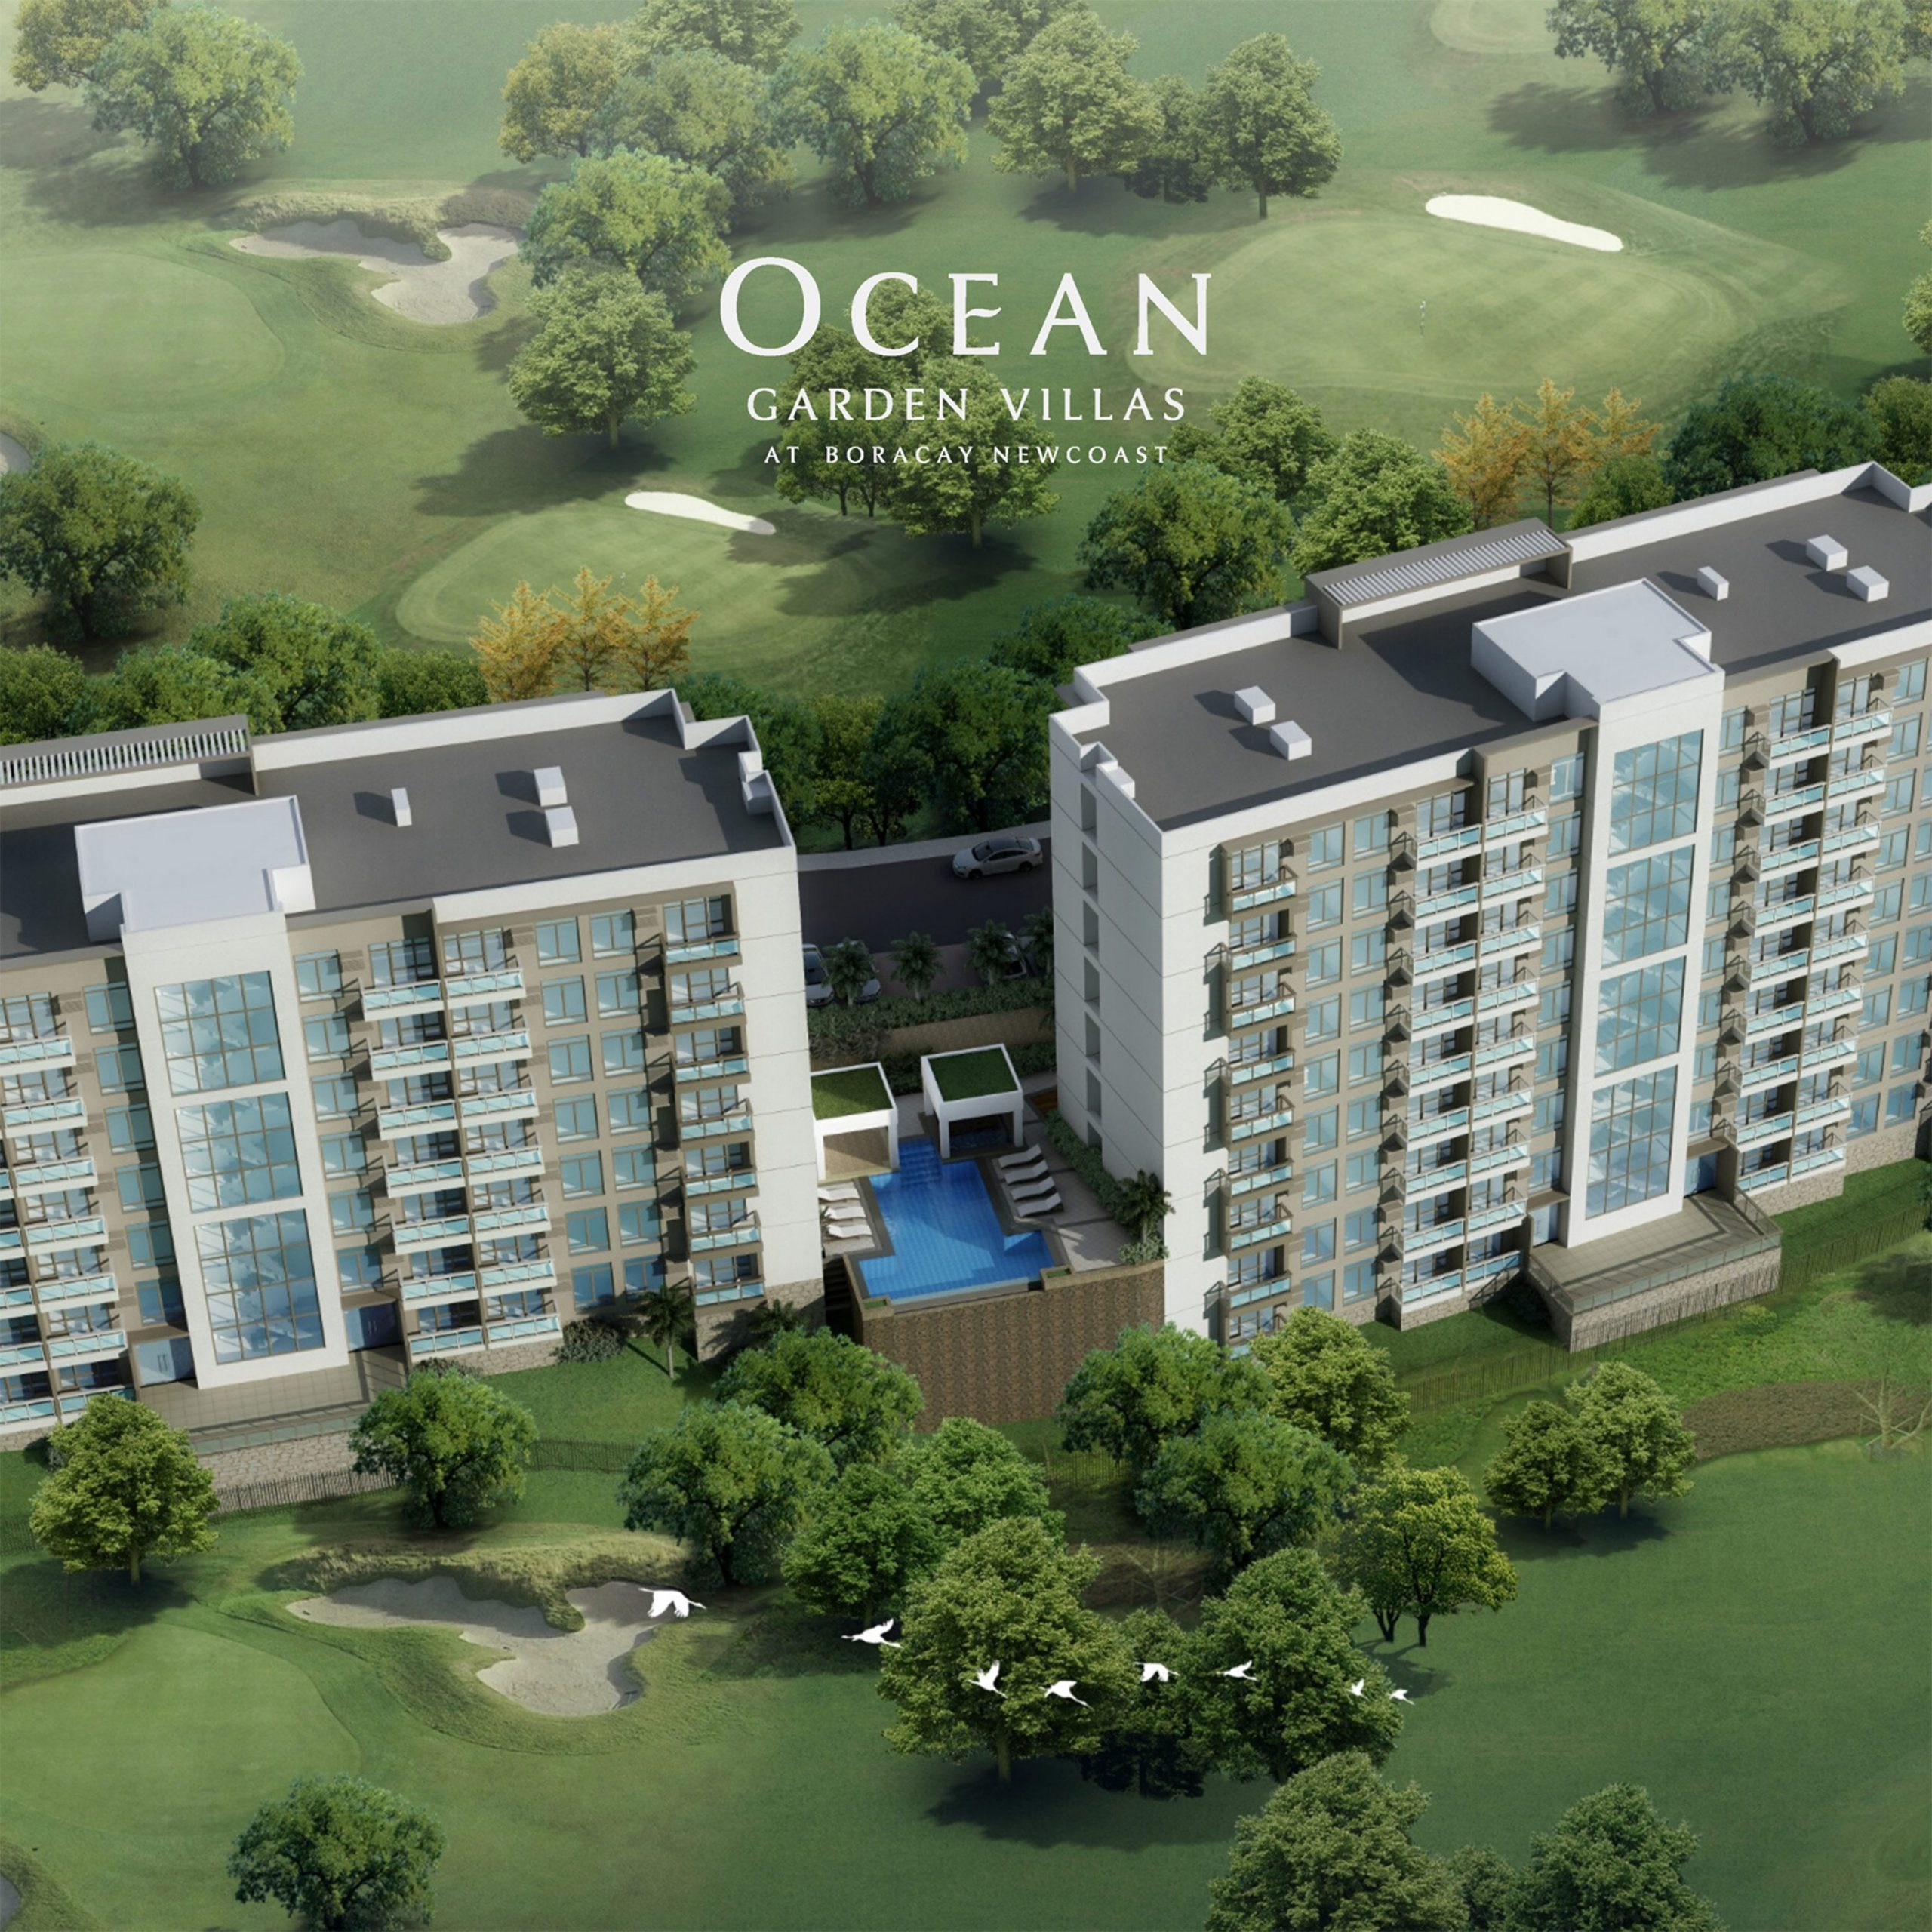 Ocean Garden Villas